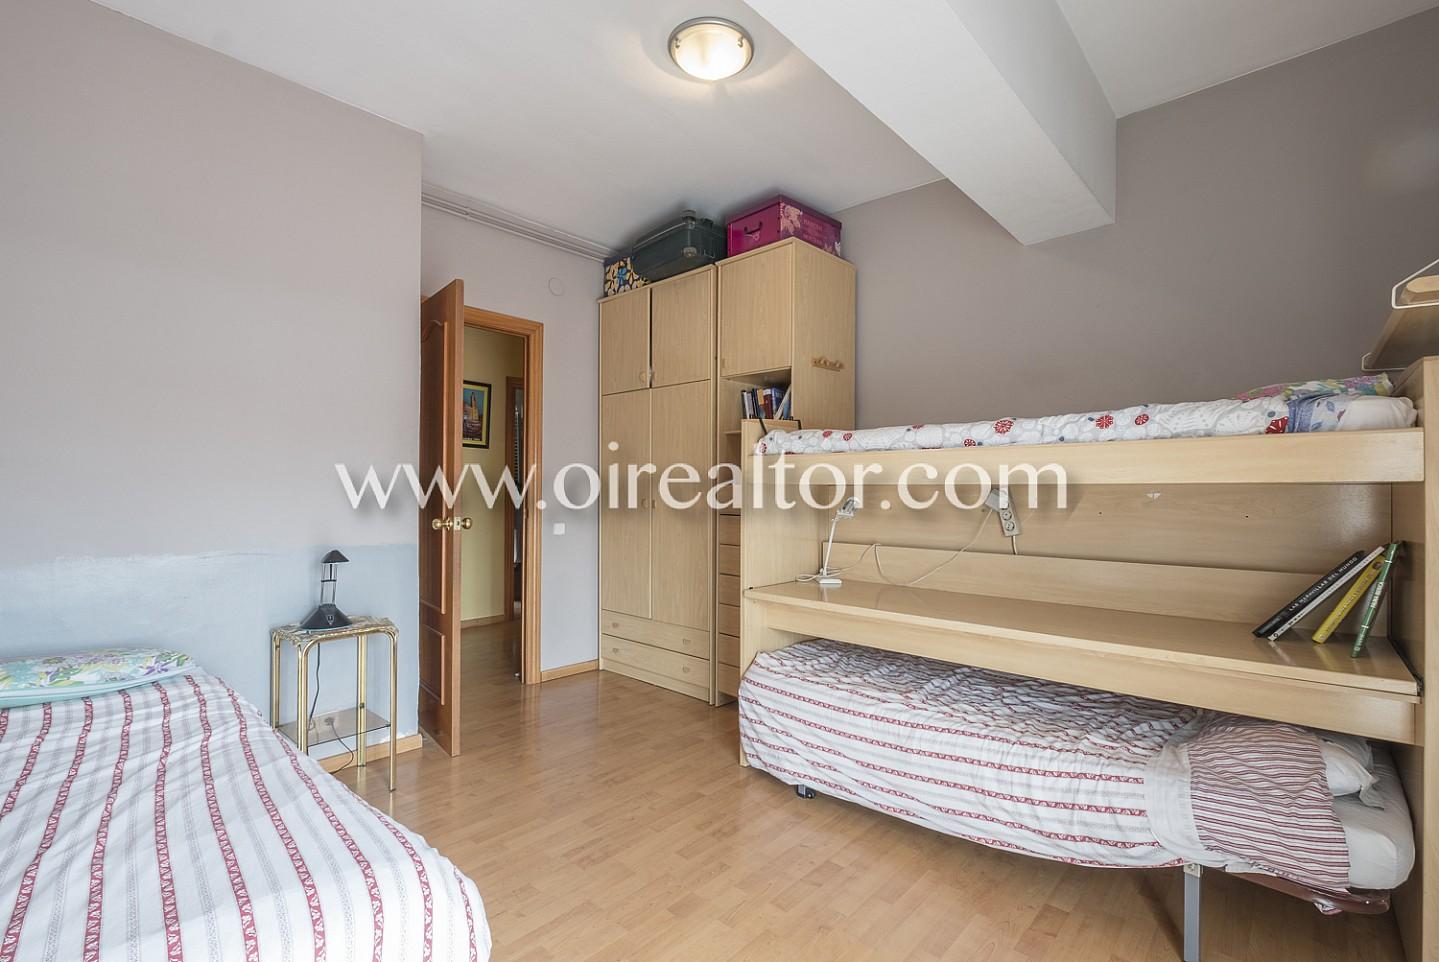 Dormitorio, dormitorio doble, dormitorio principal, cama, cama doble. luminoso